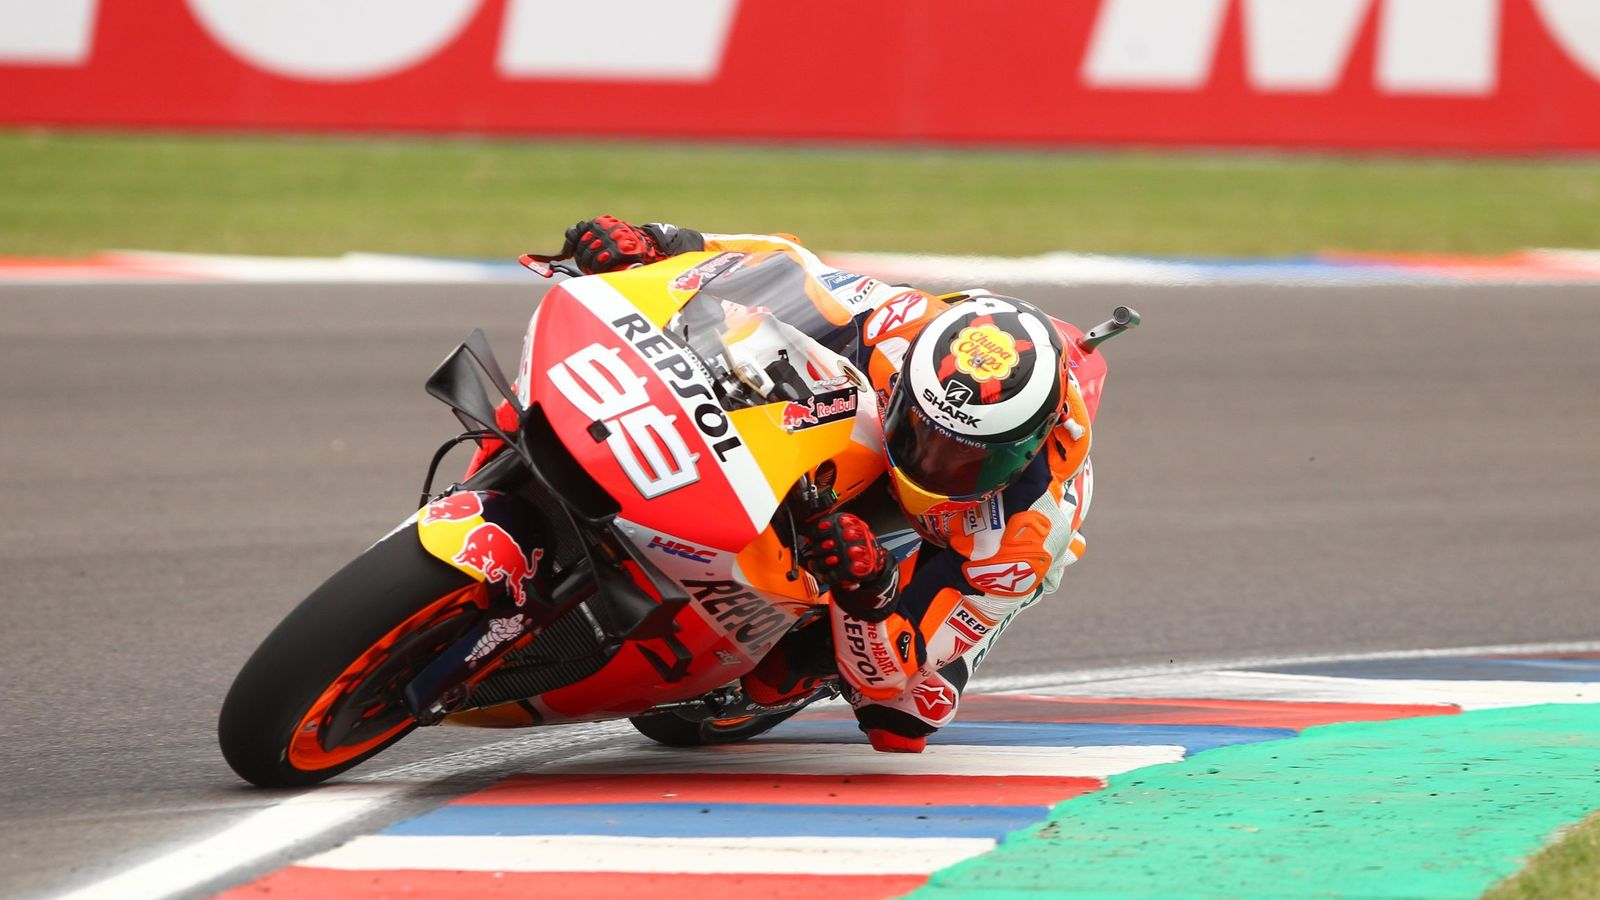 Foto: Jorge Lorenzo traza una curva con su Honda. (EFE)